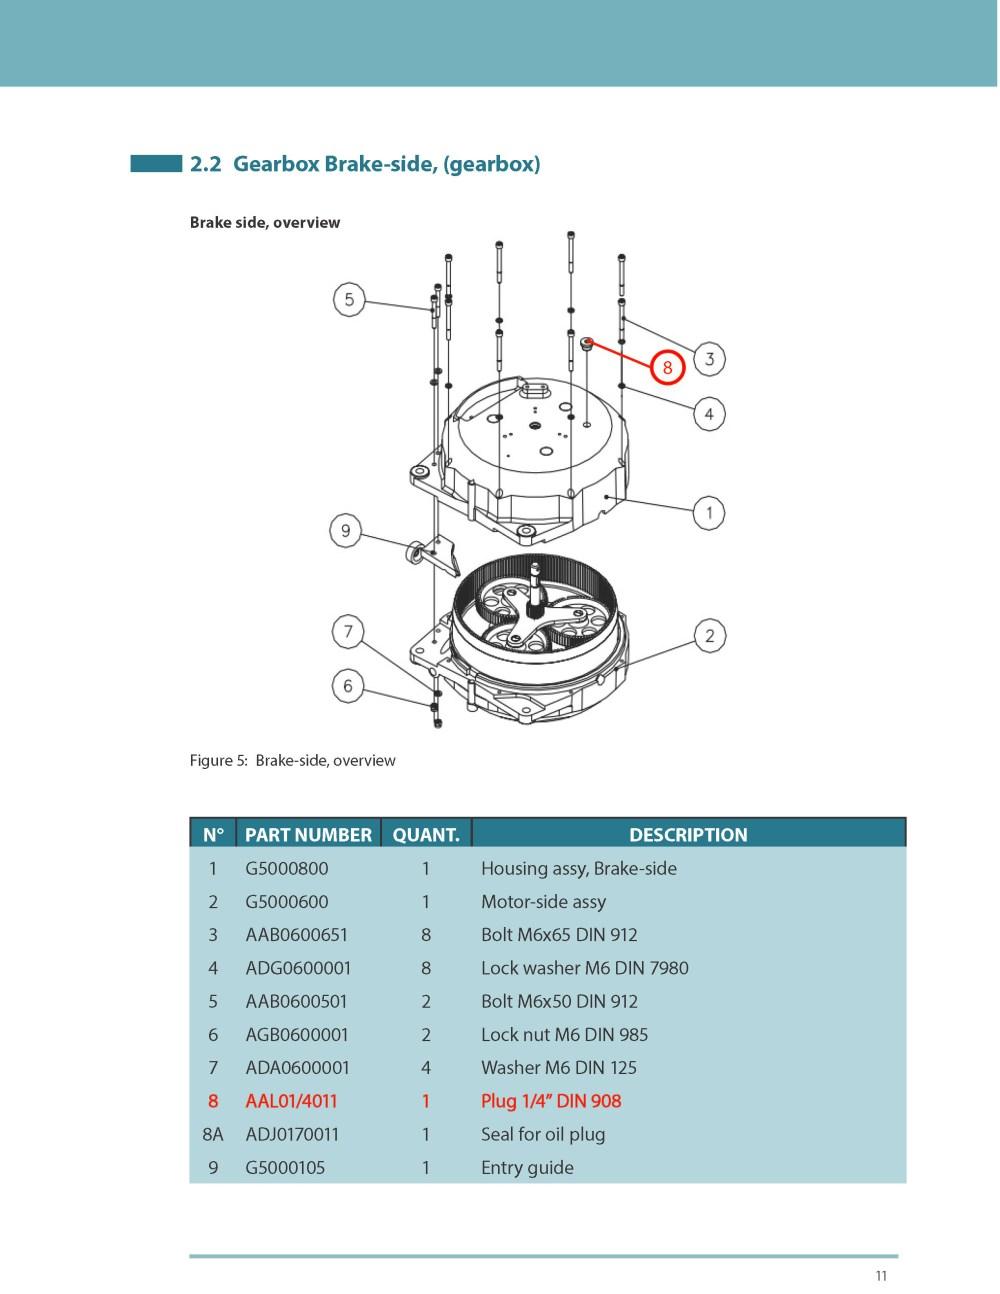 medium resolution of oil plug 1 4 din 908 zinc plated